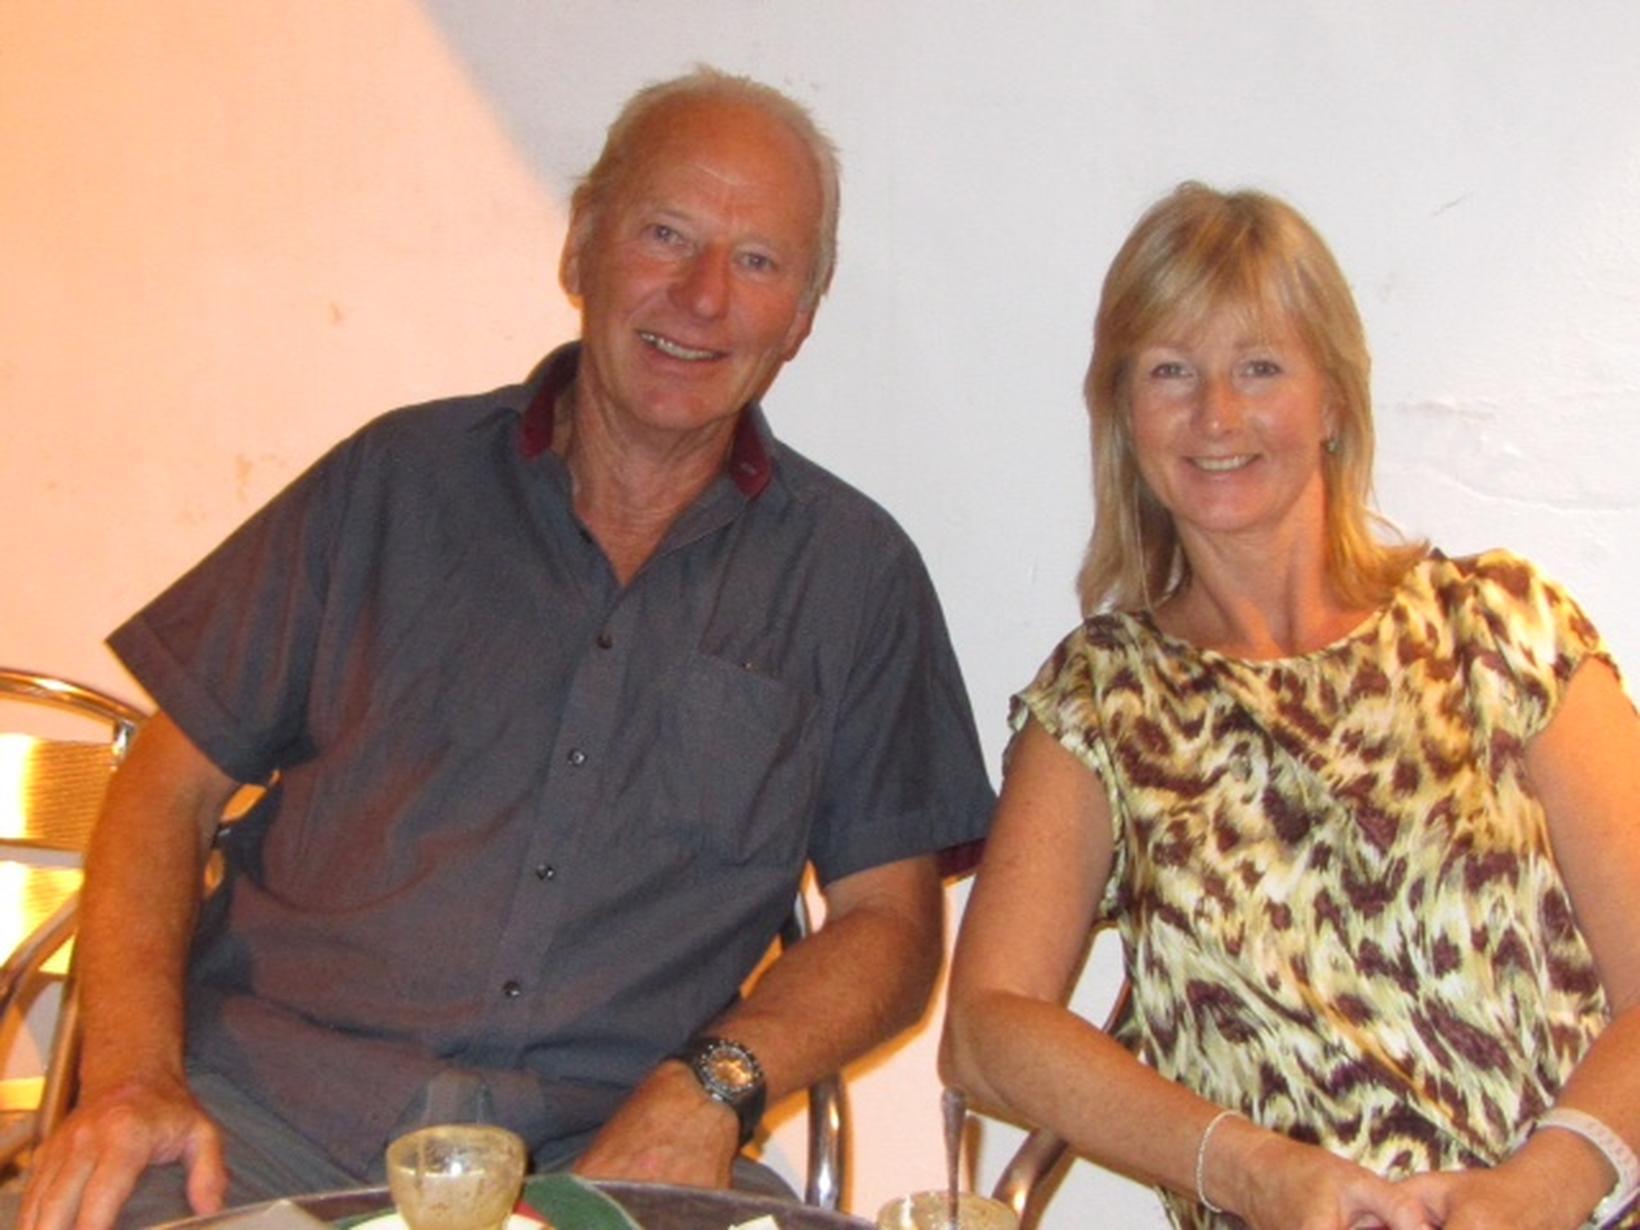 Paul & Ann from Auckland, New Zealand